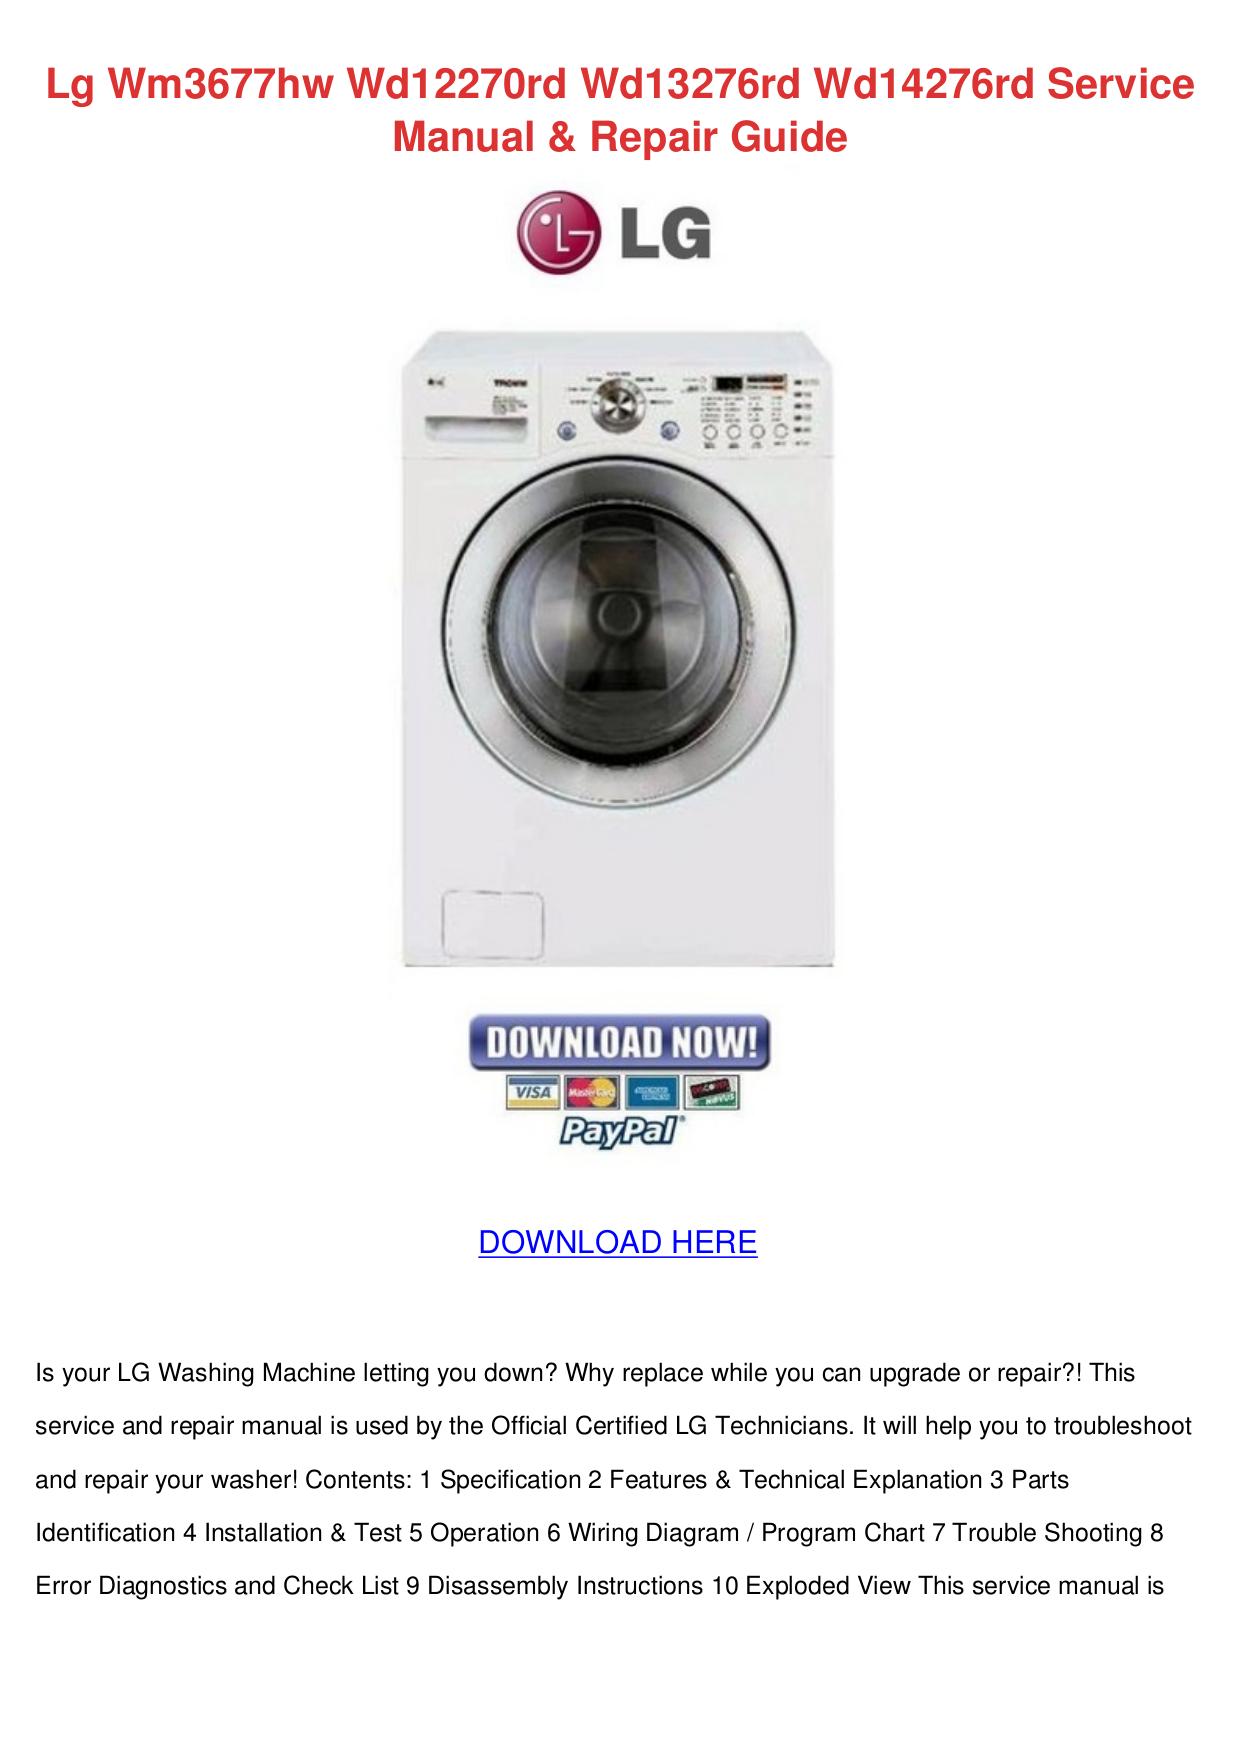 Download Free Pdf For Lg Wm3677hw Washer Manual